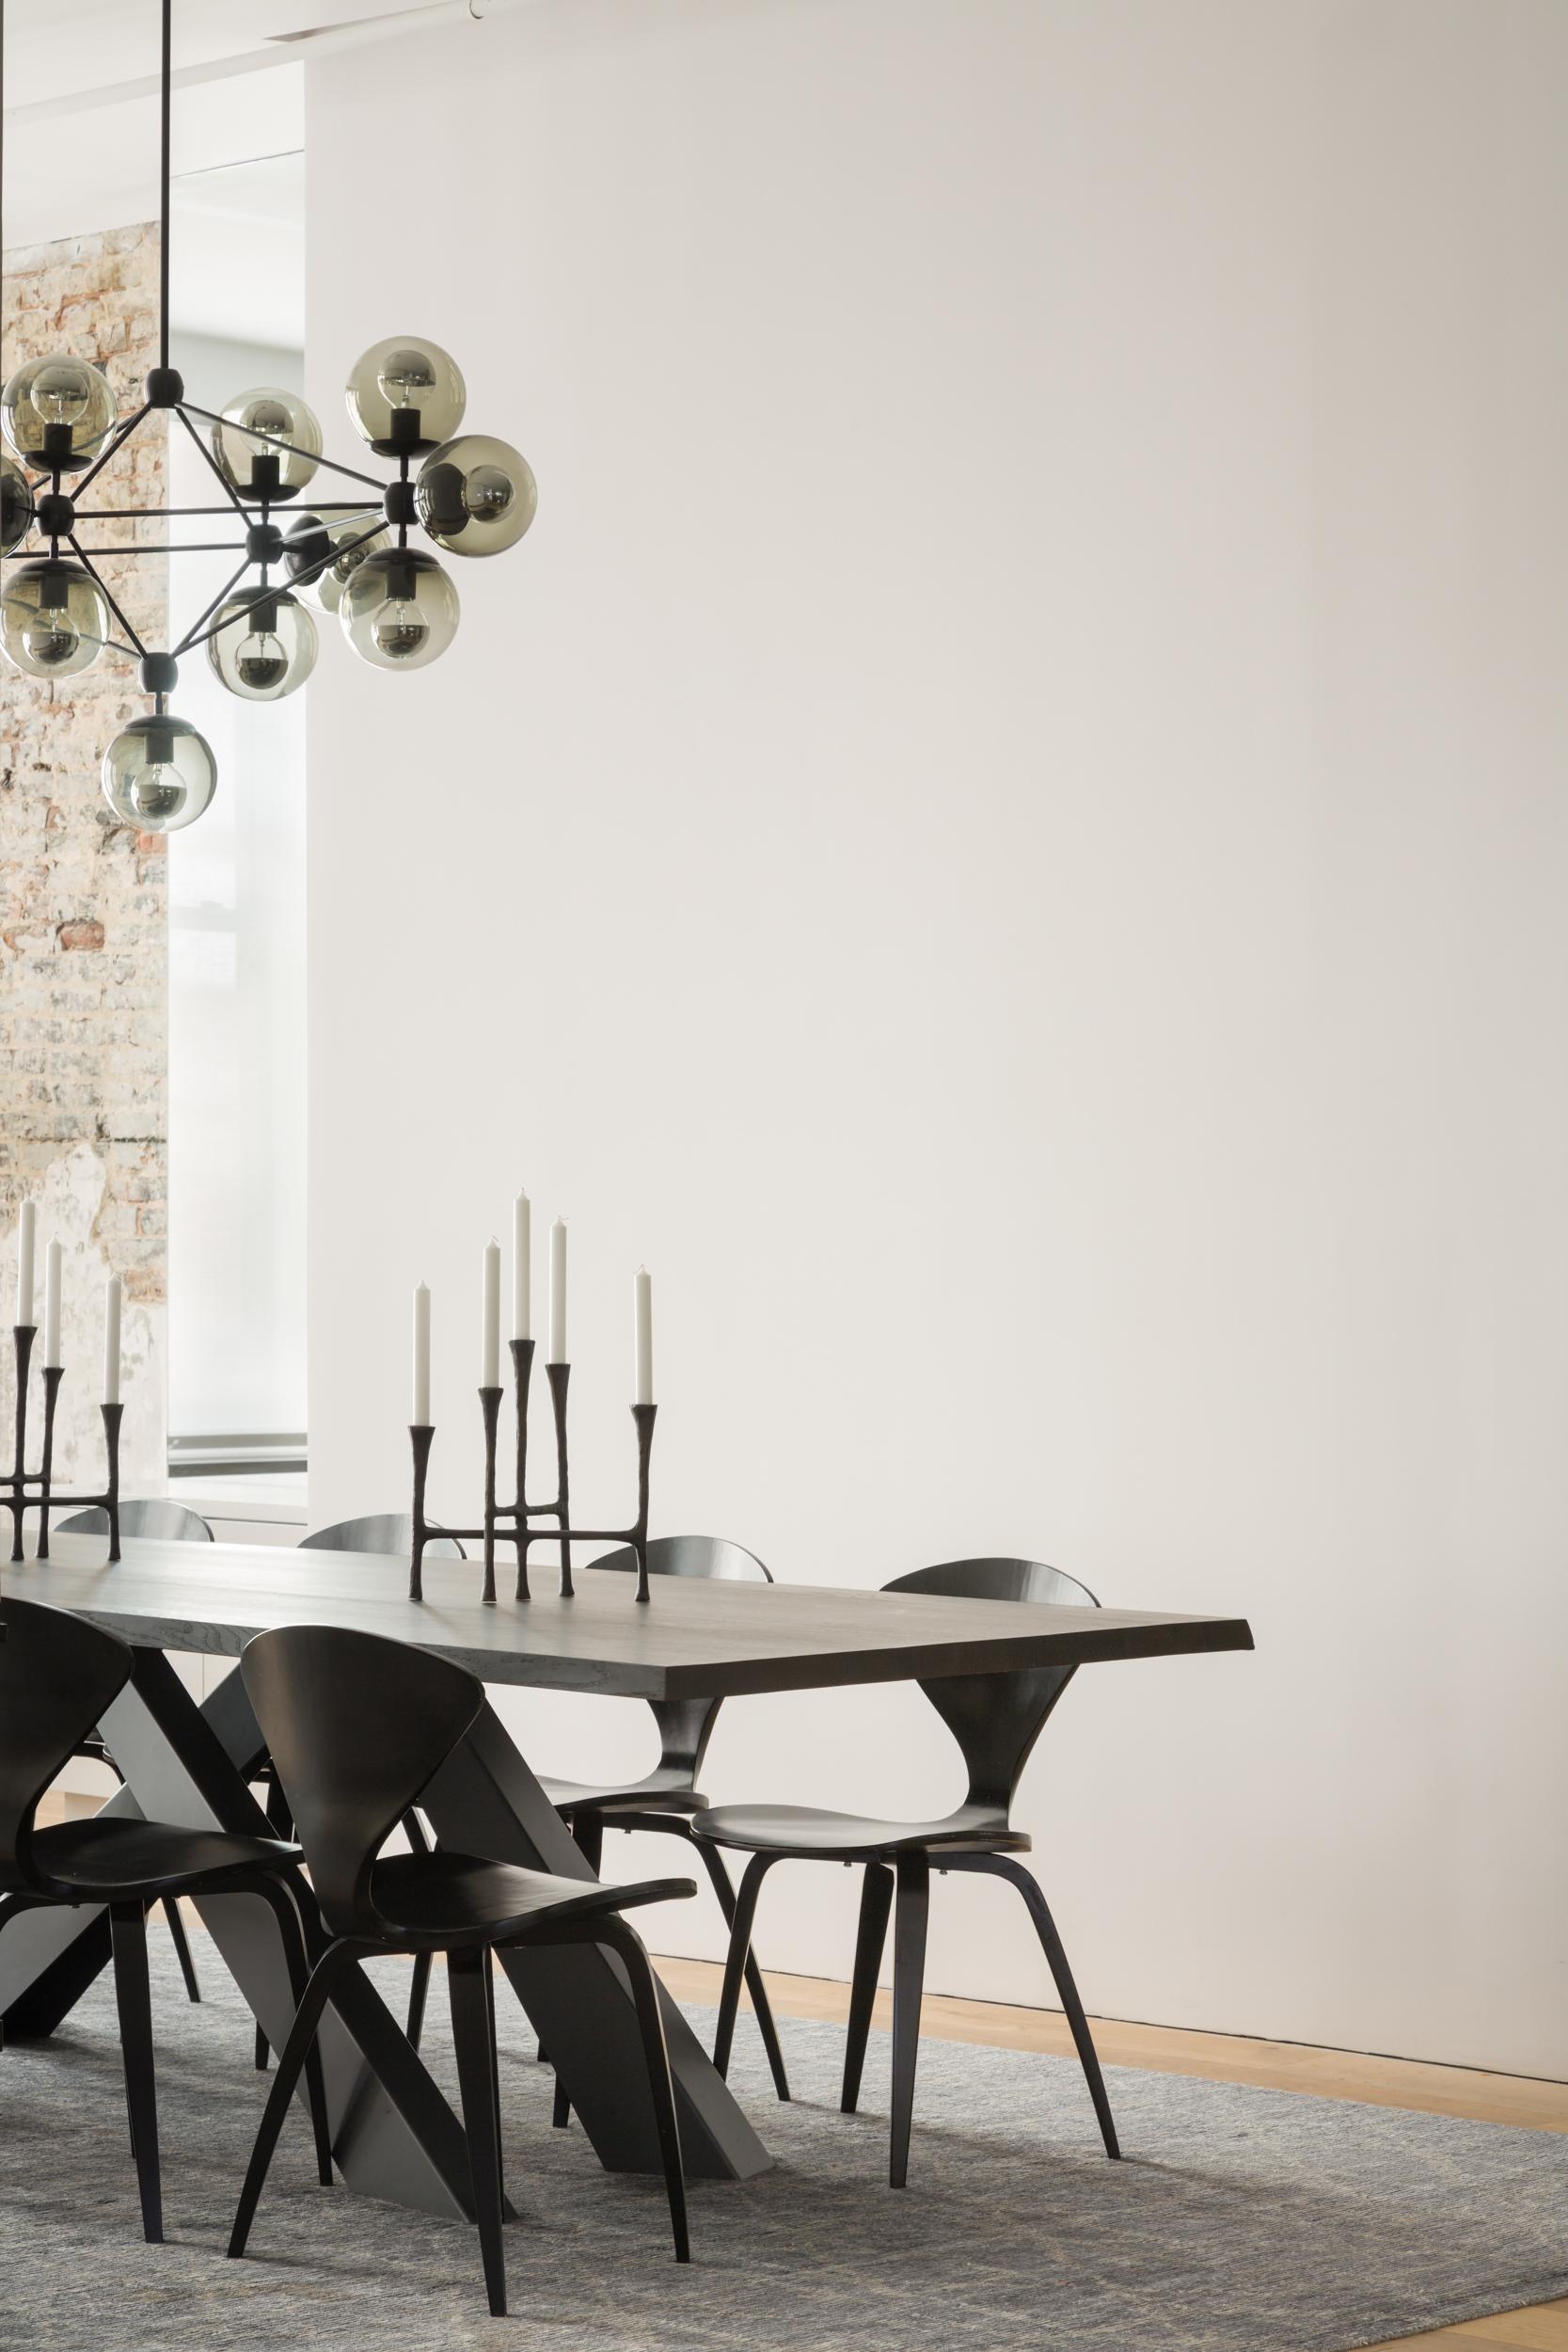 Paul Craig, Interior Photographer, Residential Photography, London, Dining Room